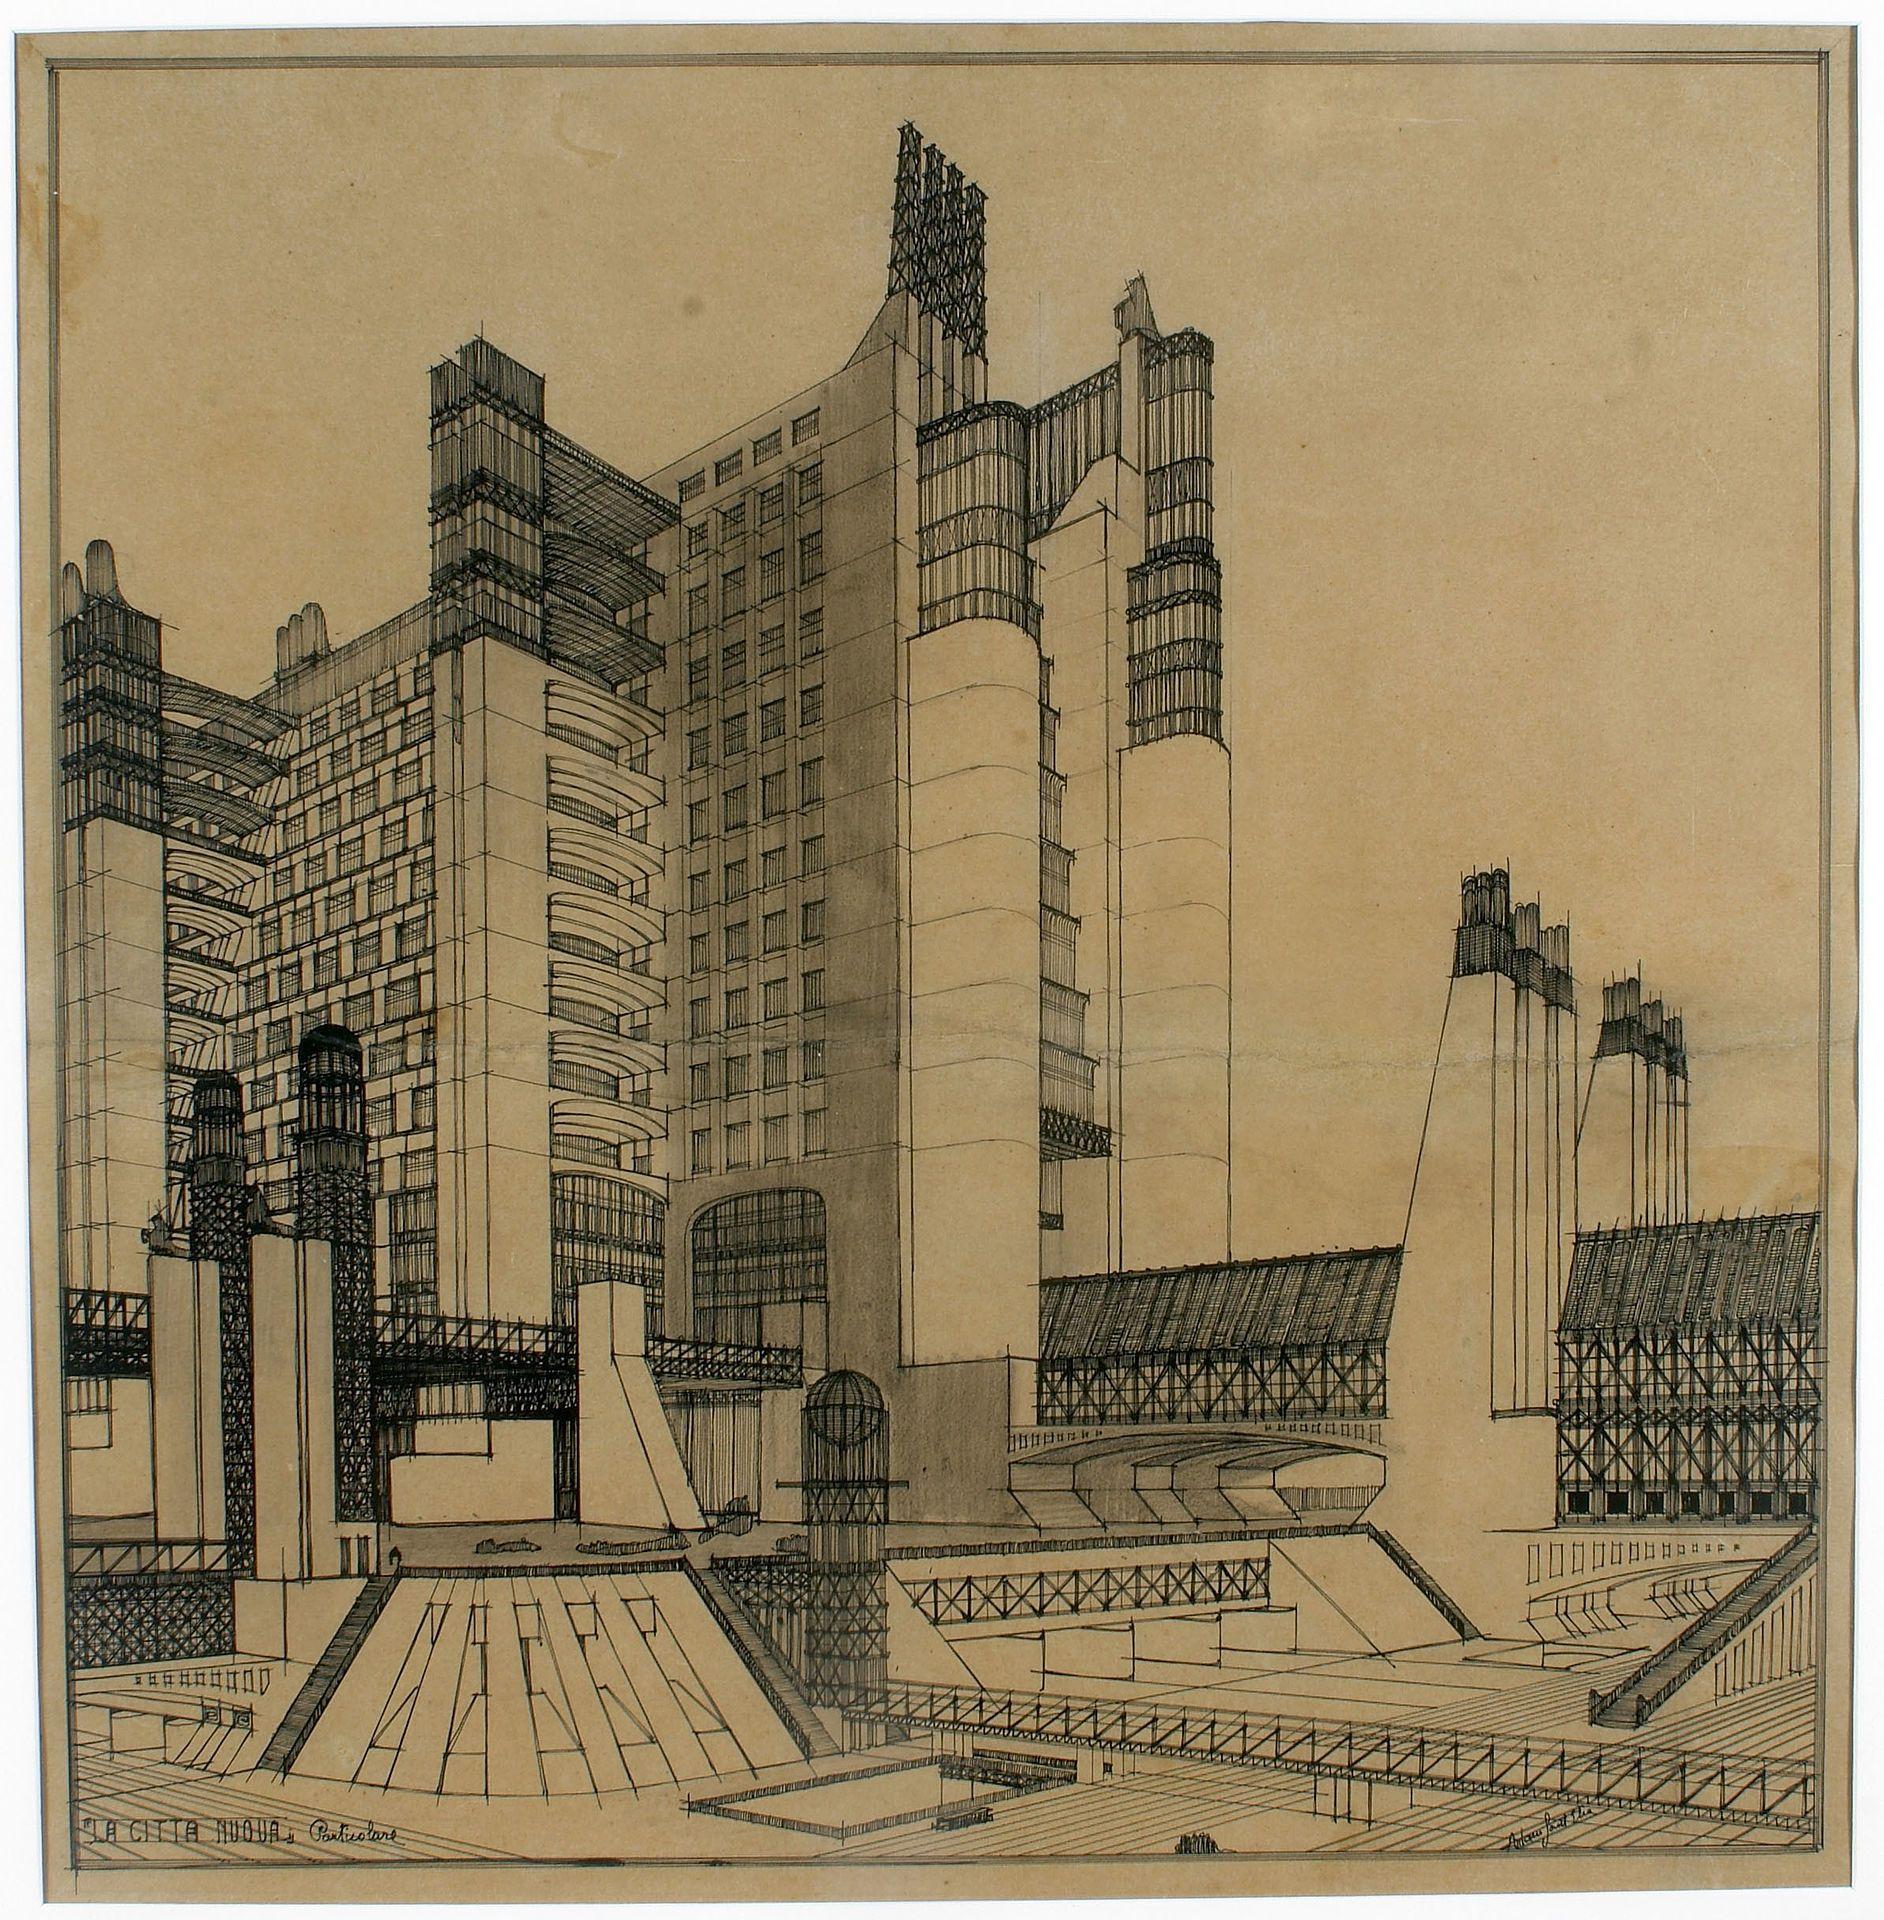 An example of Futurist architecture by Antonio Sant'Elia ...